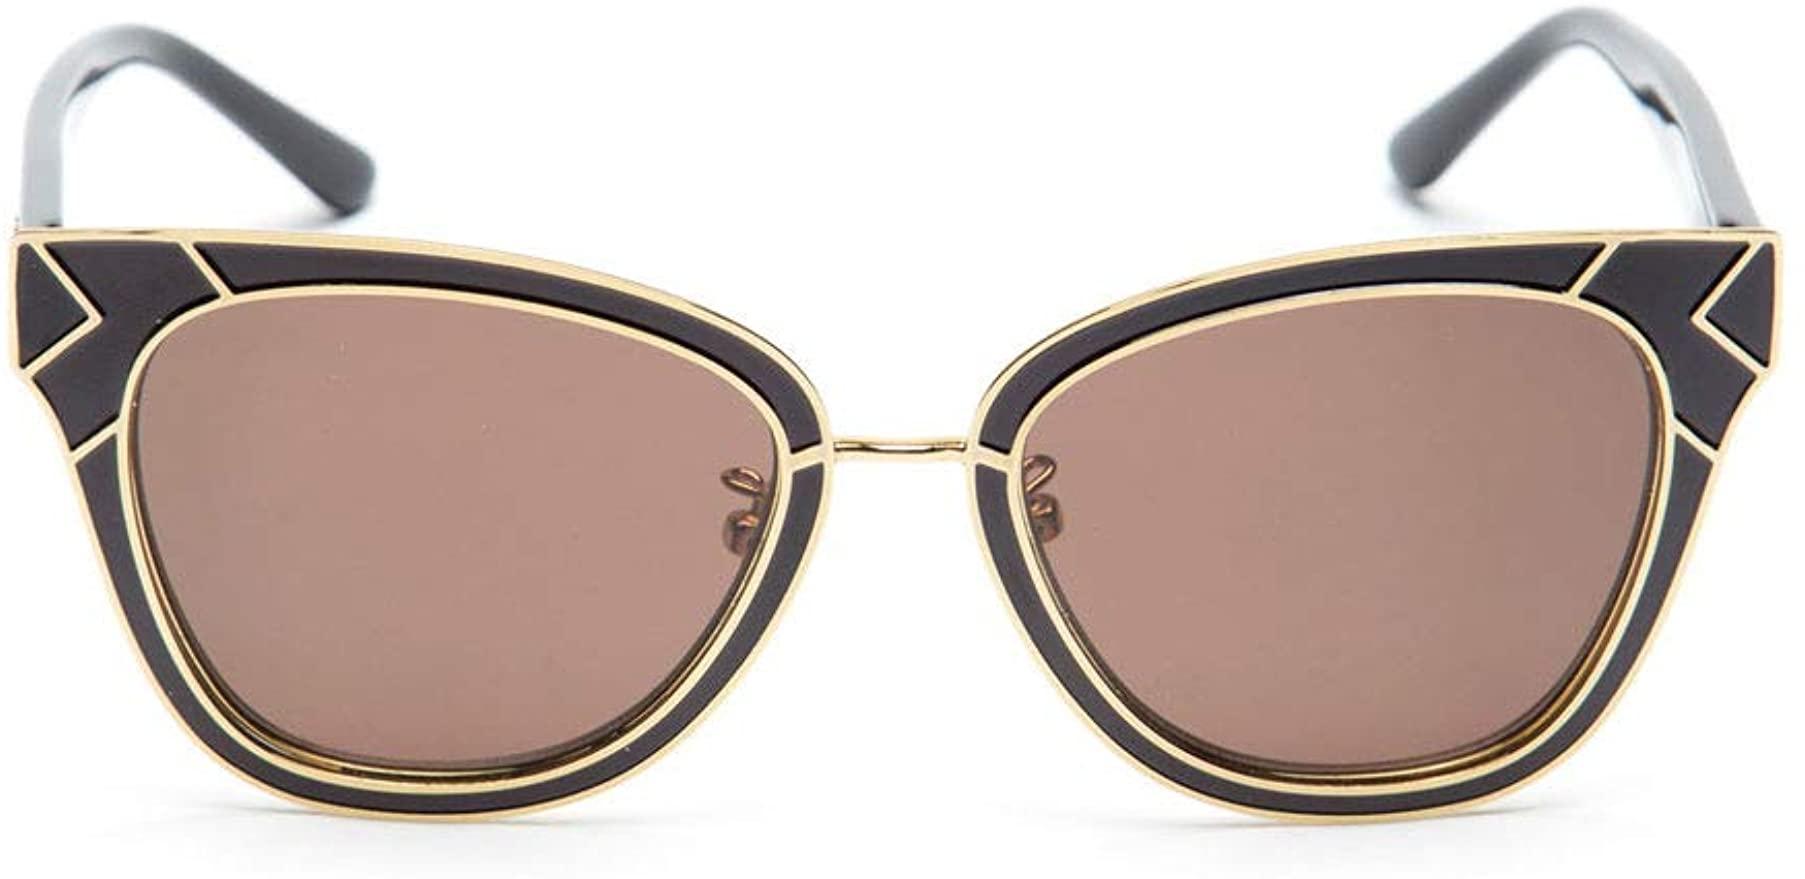 Tory Burch 0TY6061 Sunglasses